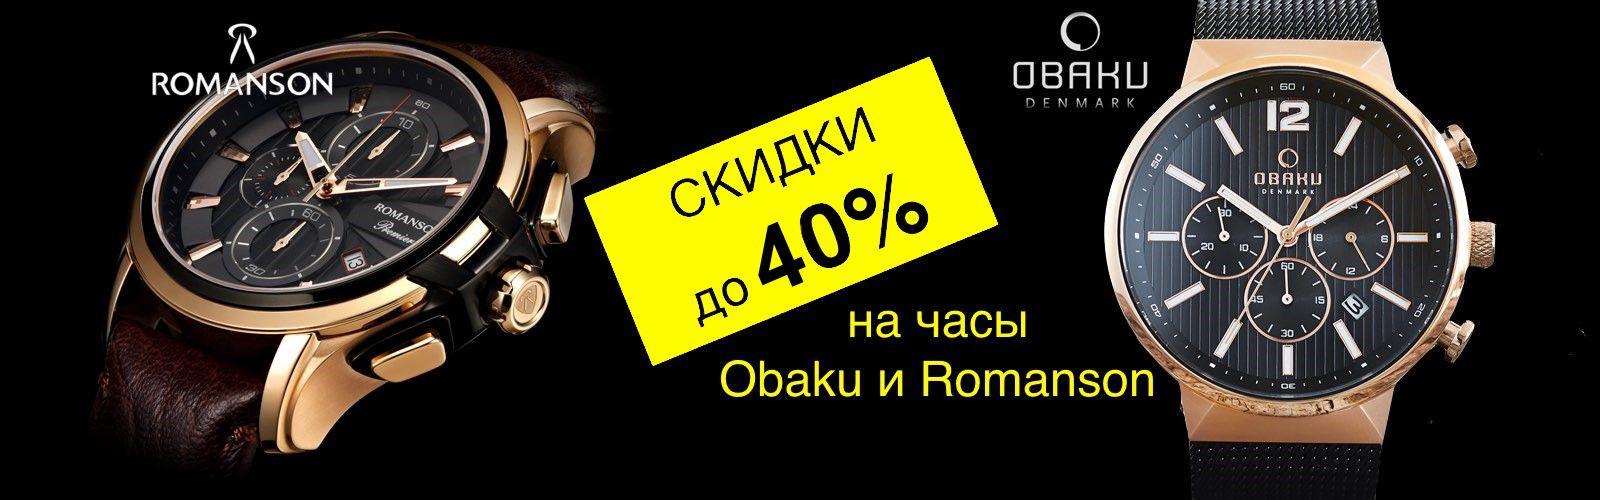 sl-rom-ob.002-40